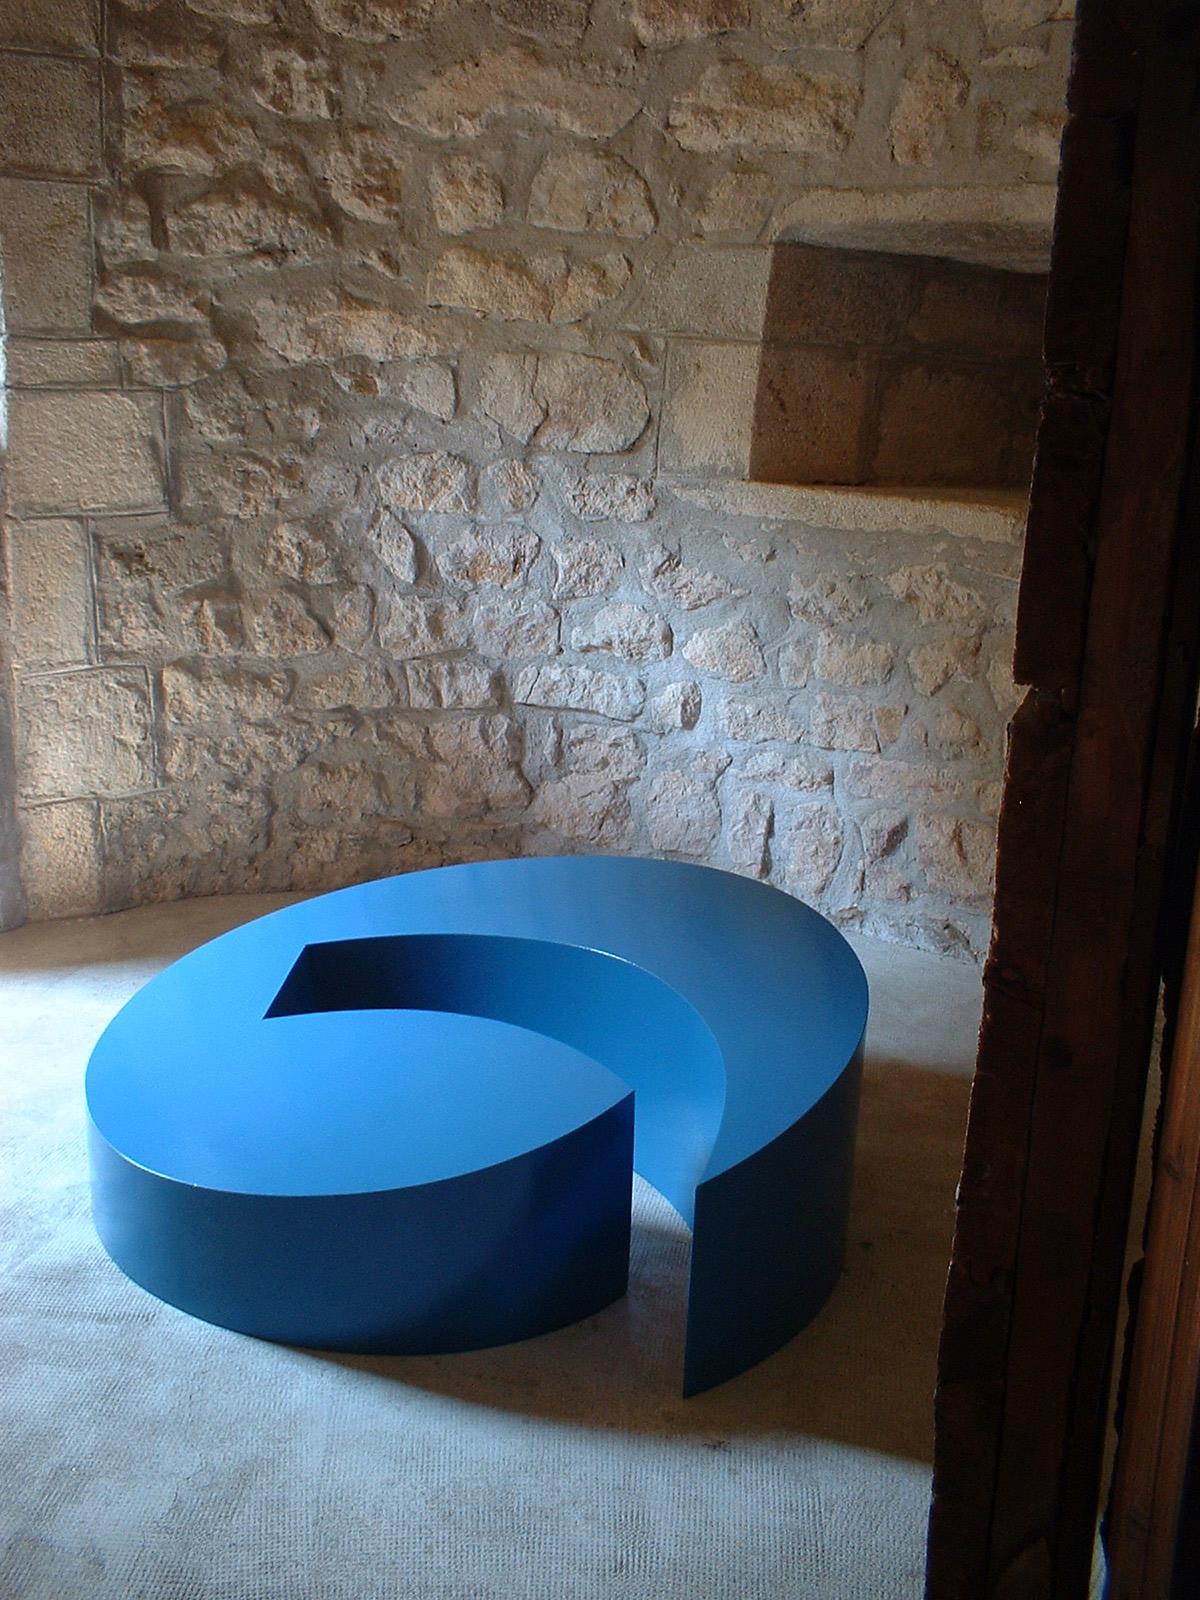 Milos CVACH, sculpture, 2004.